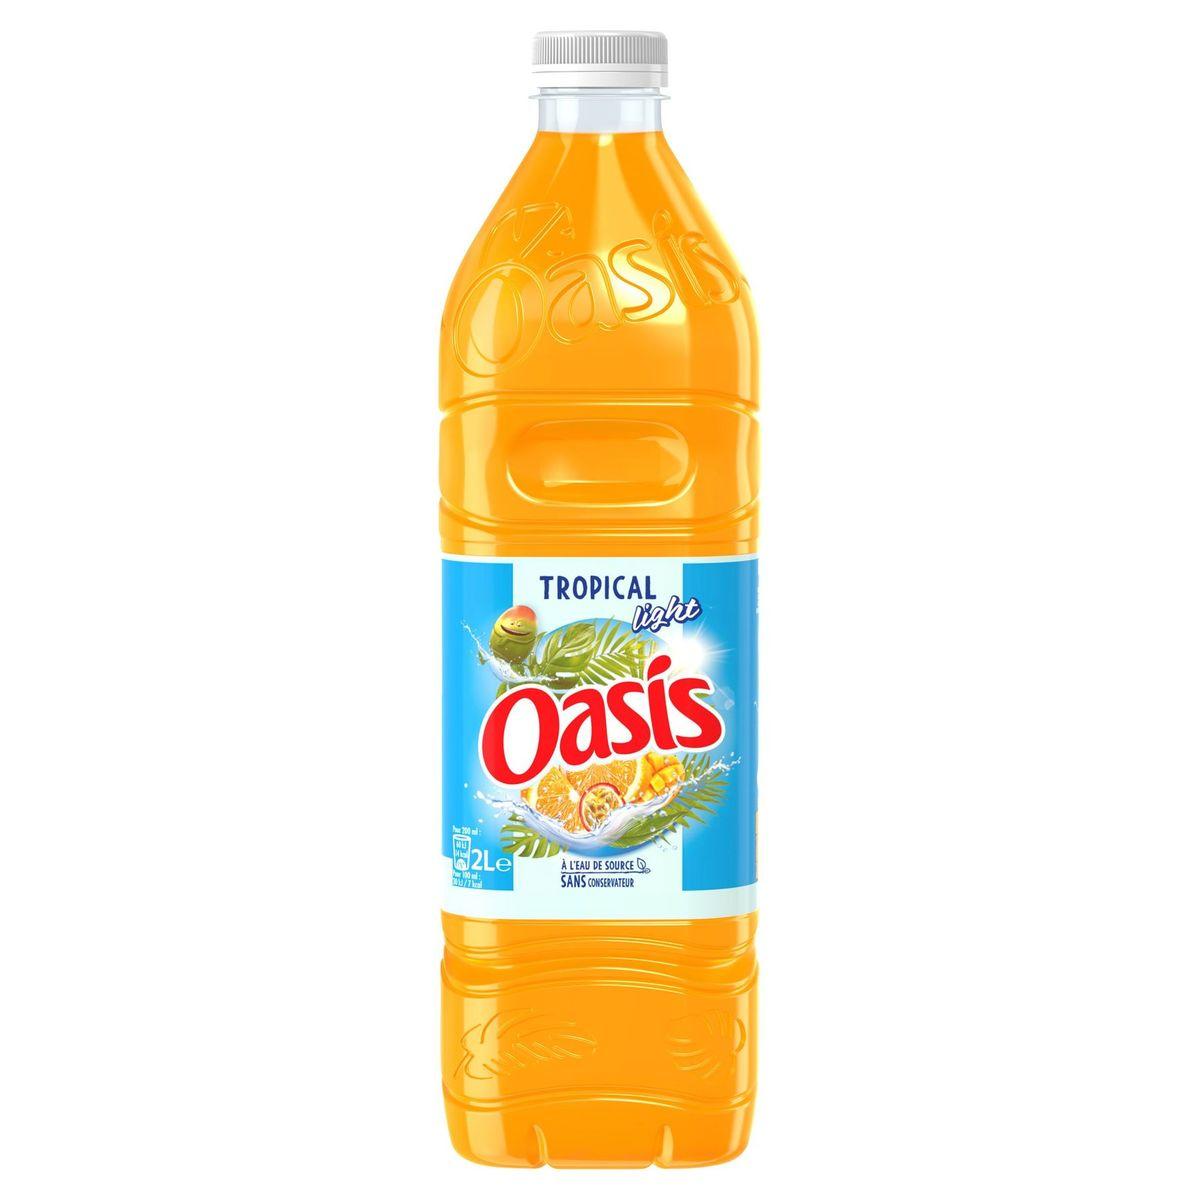 Oasis Tropical Light 2 L